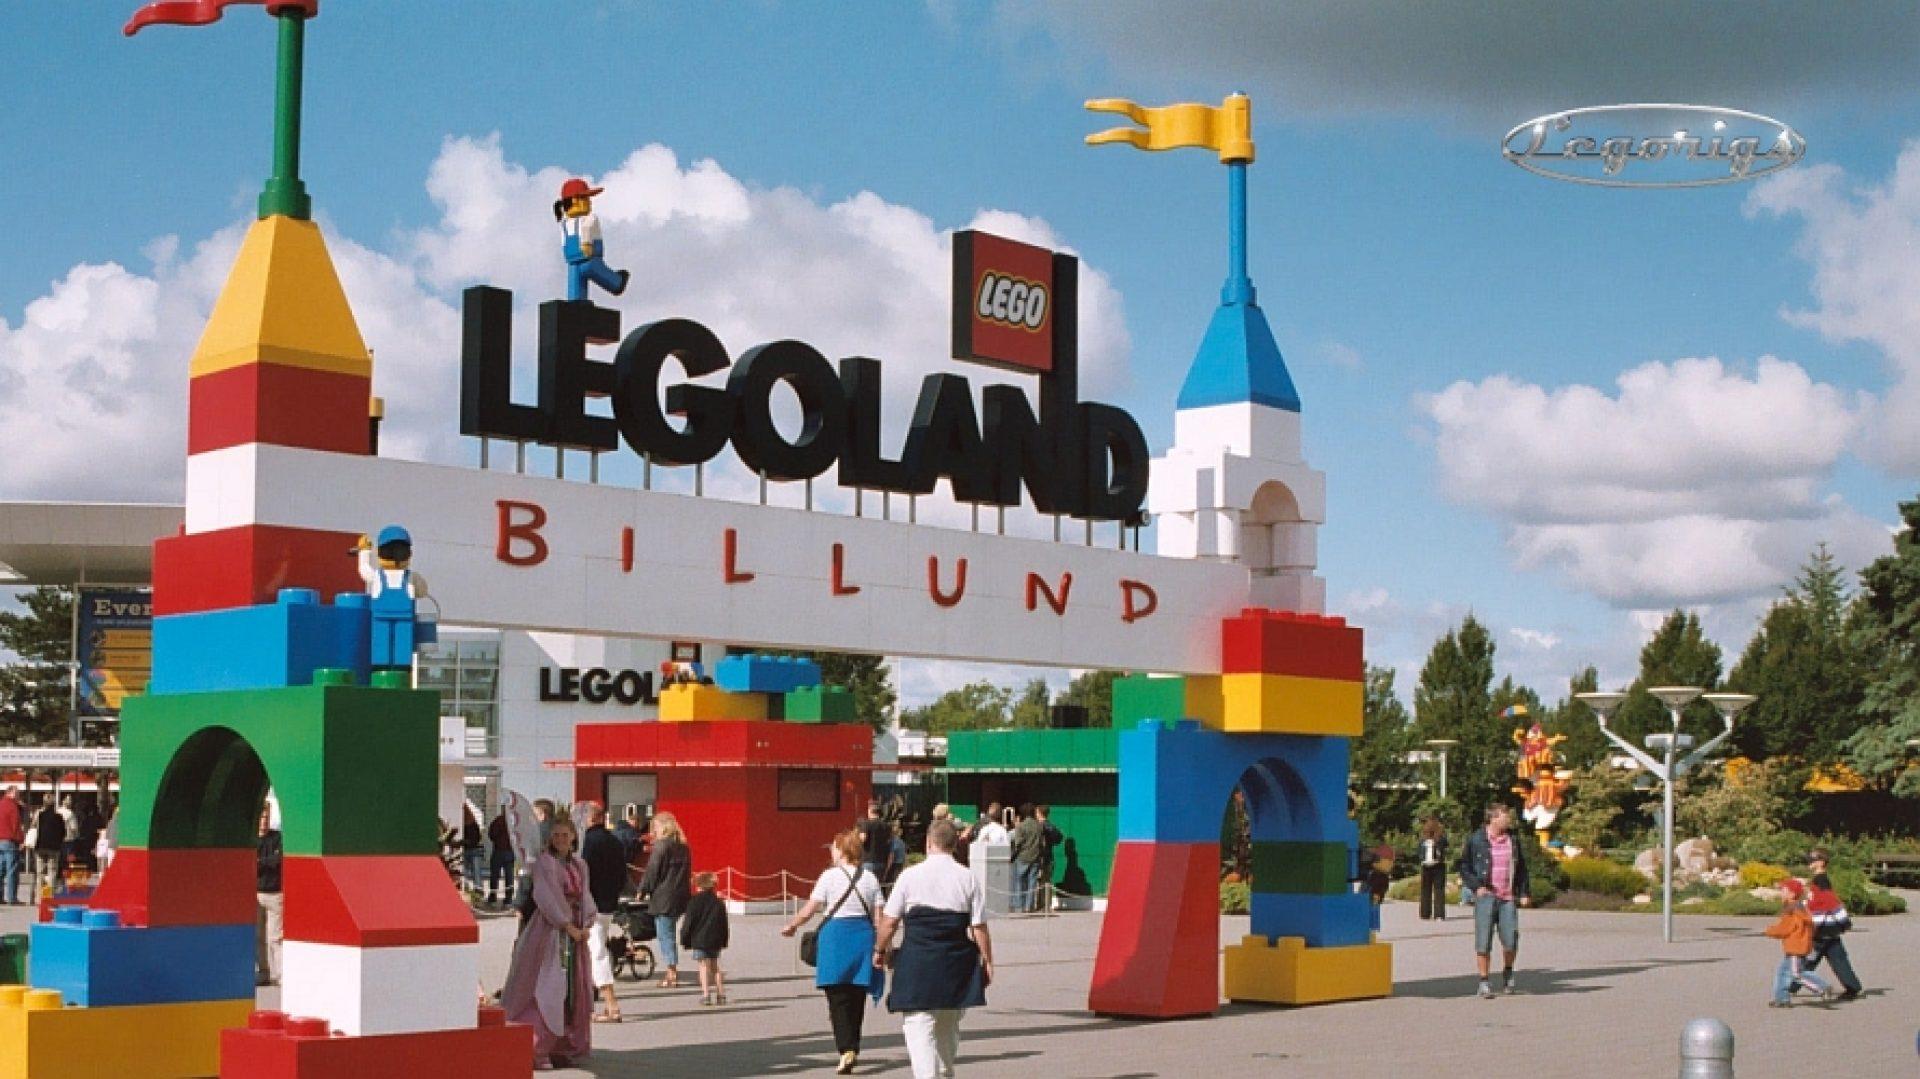 Legorigs